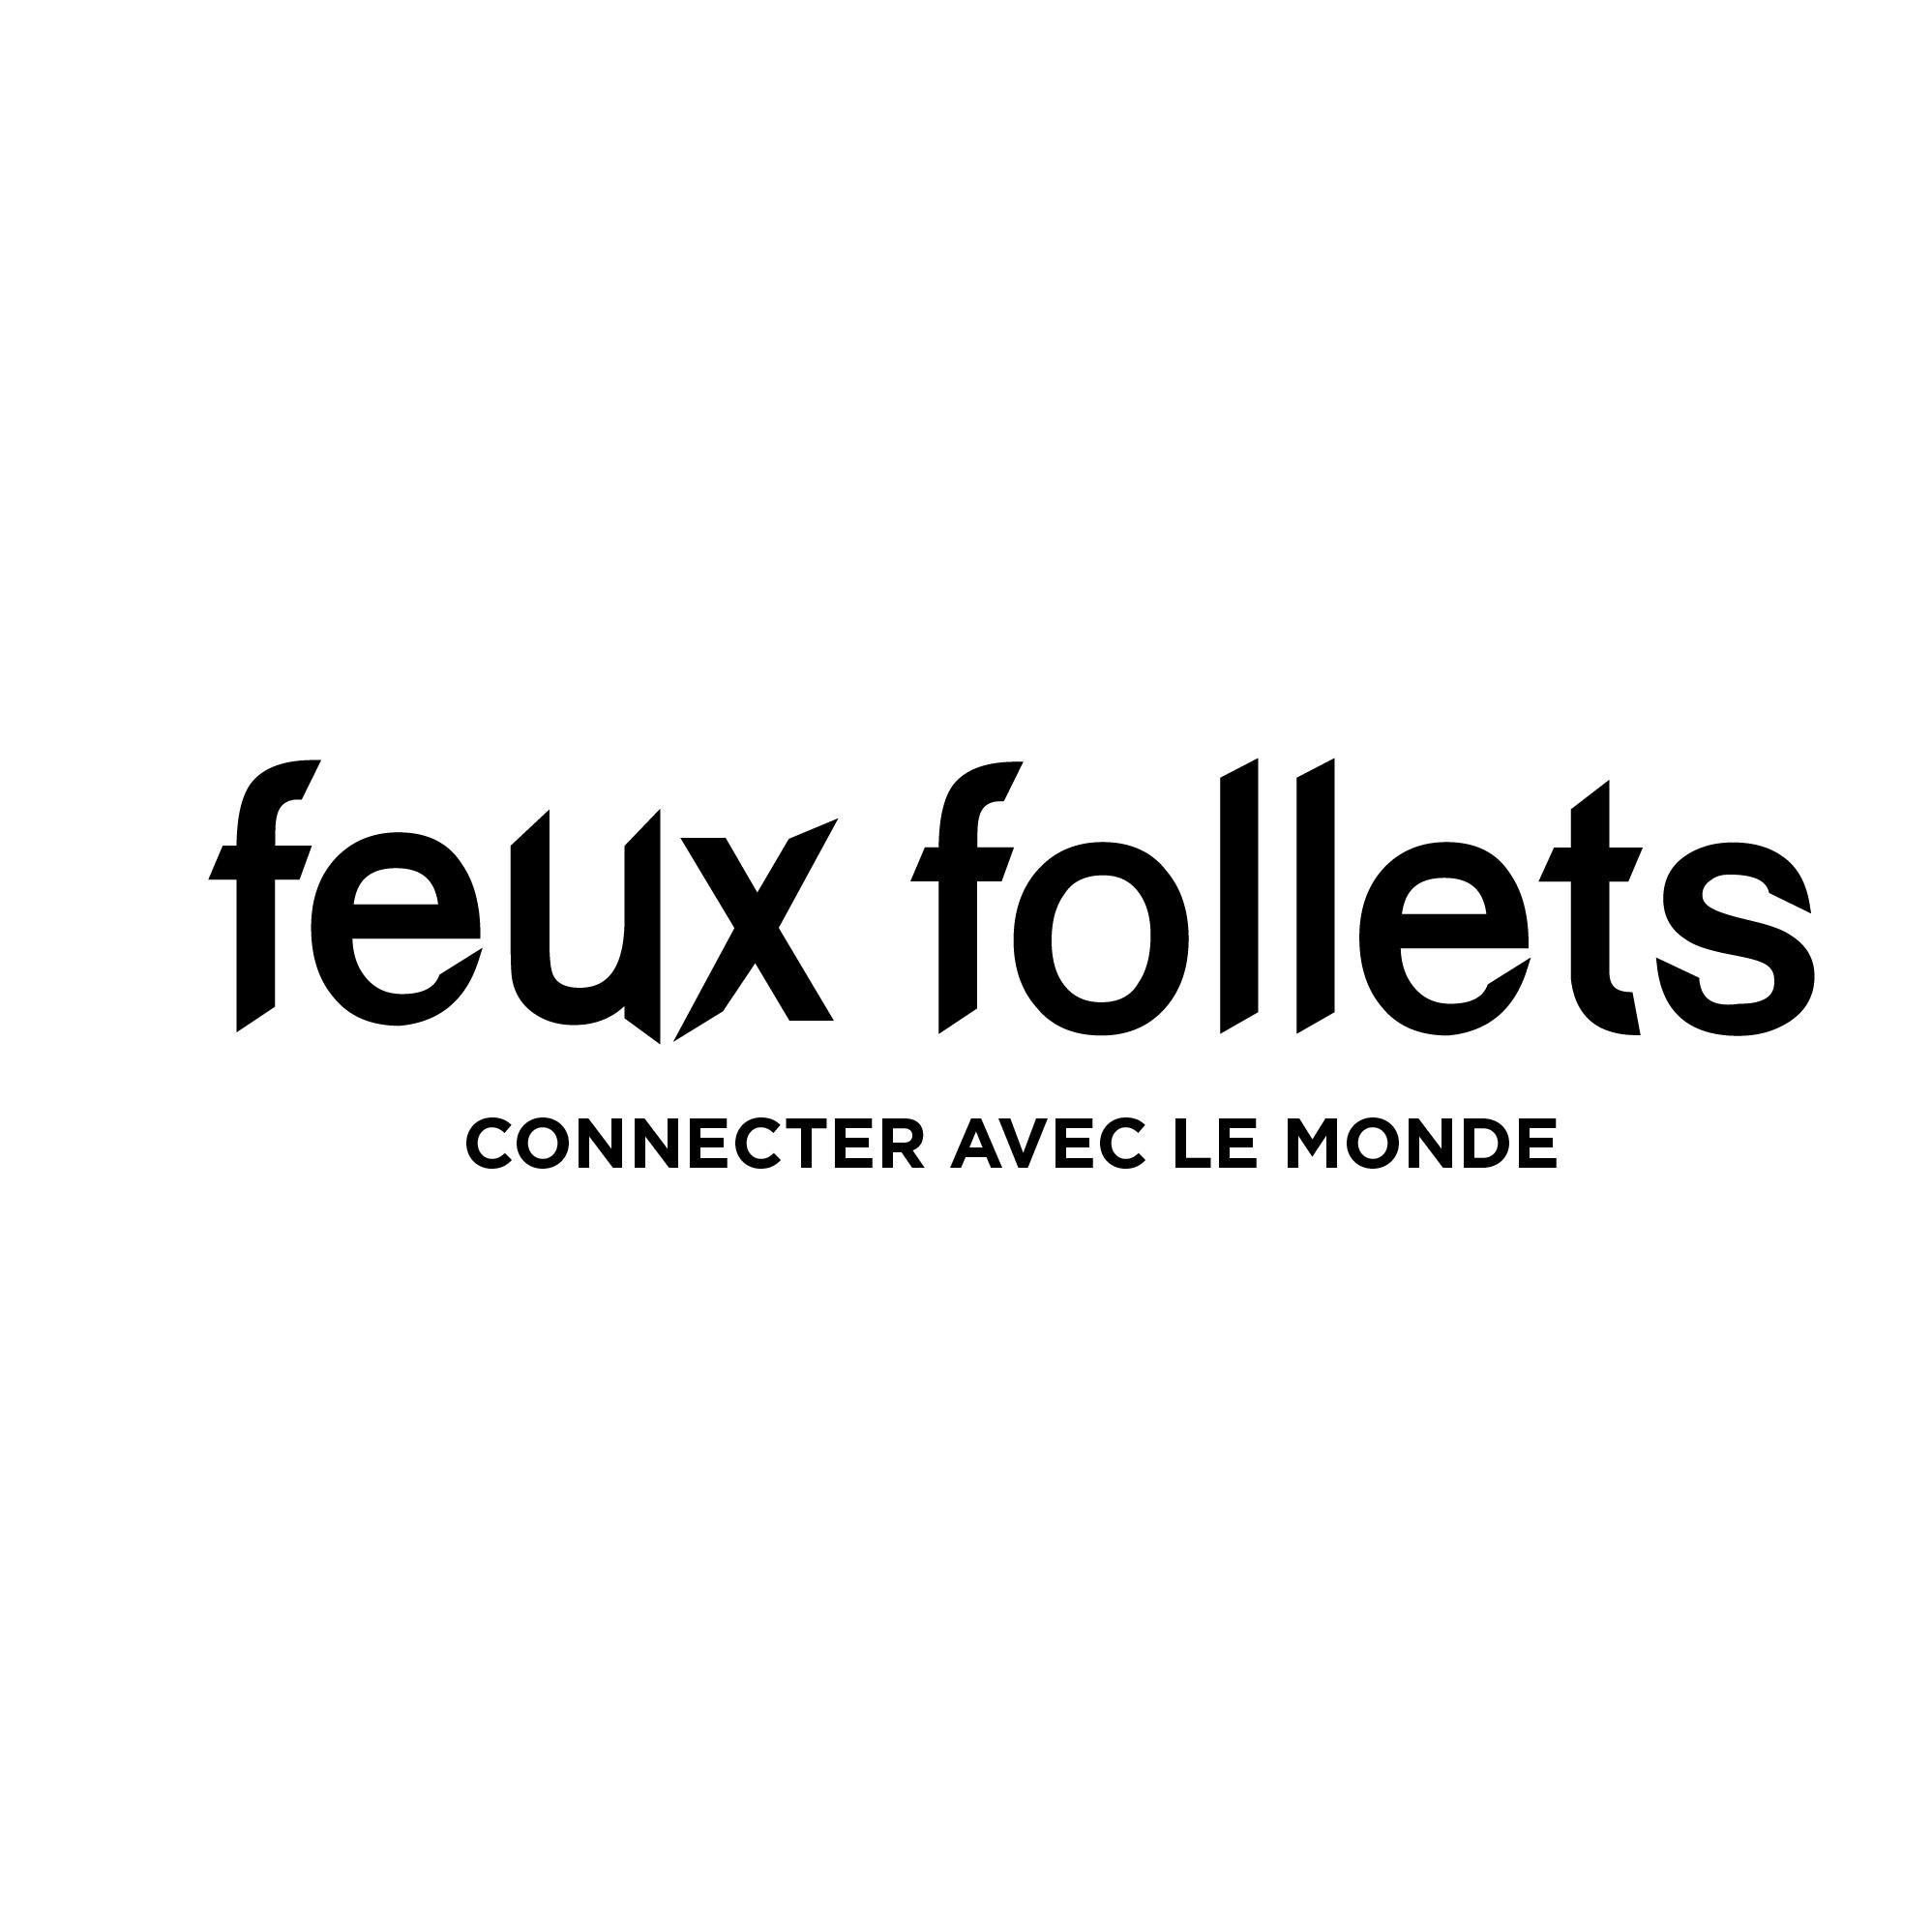 Feux follet_Logo_Signature-21.png